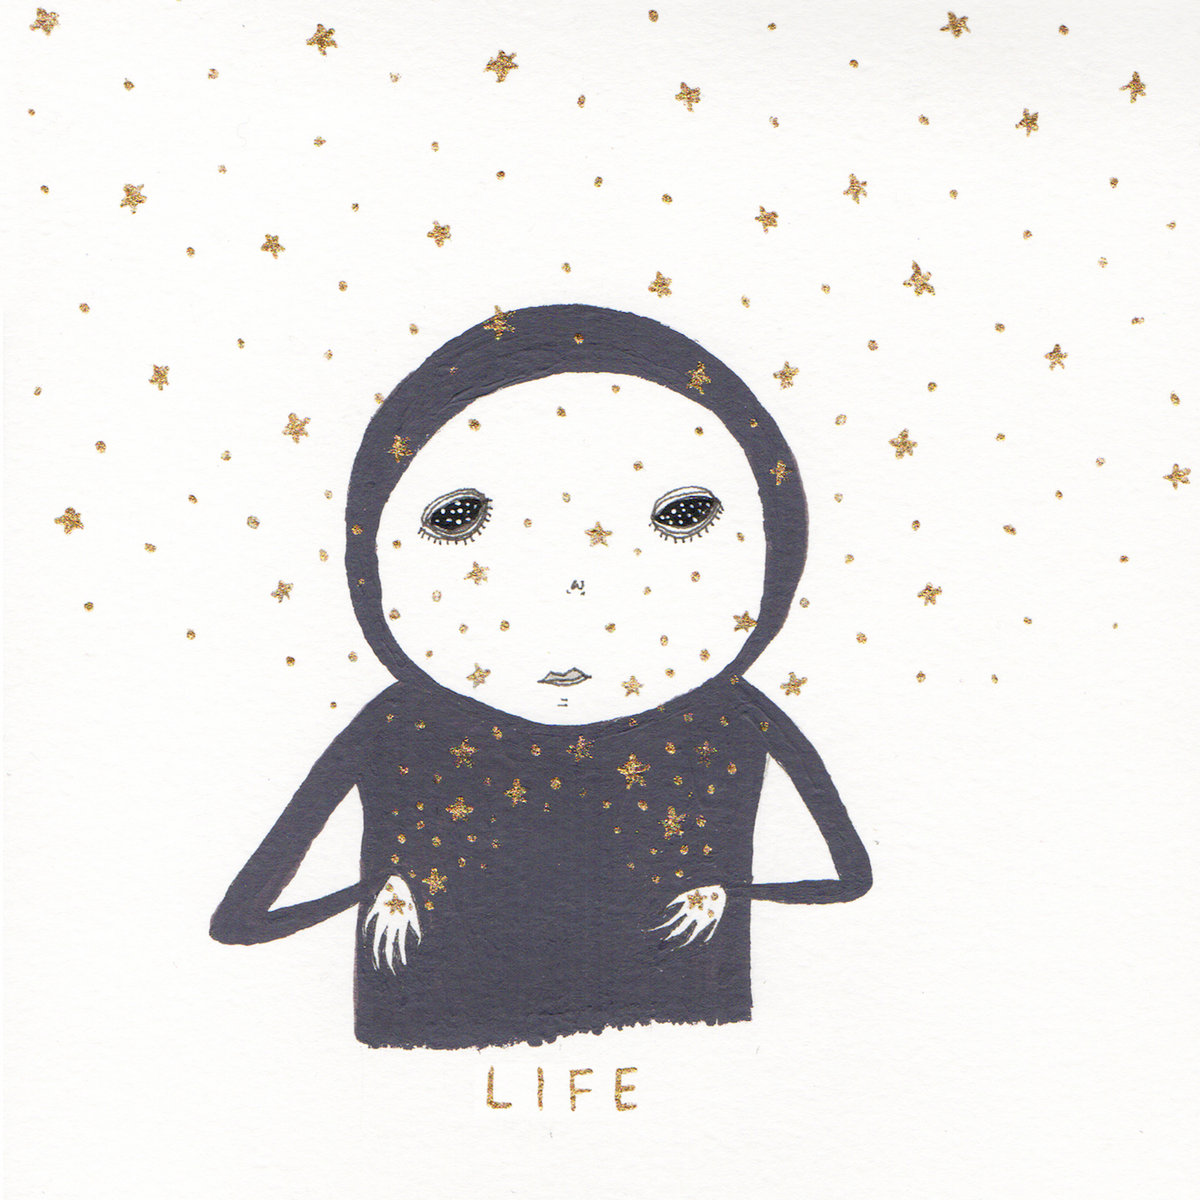 LIFE | alvr